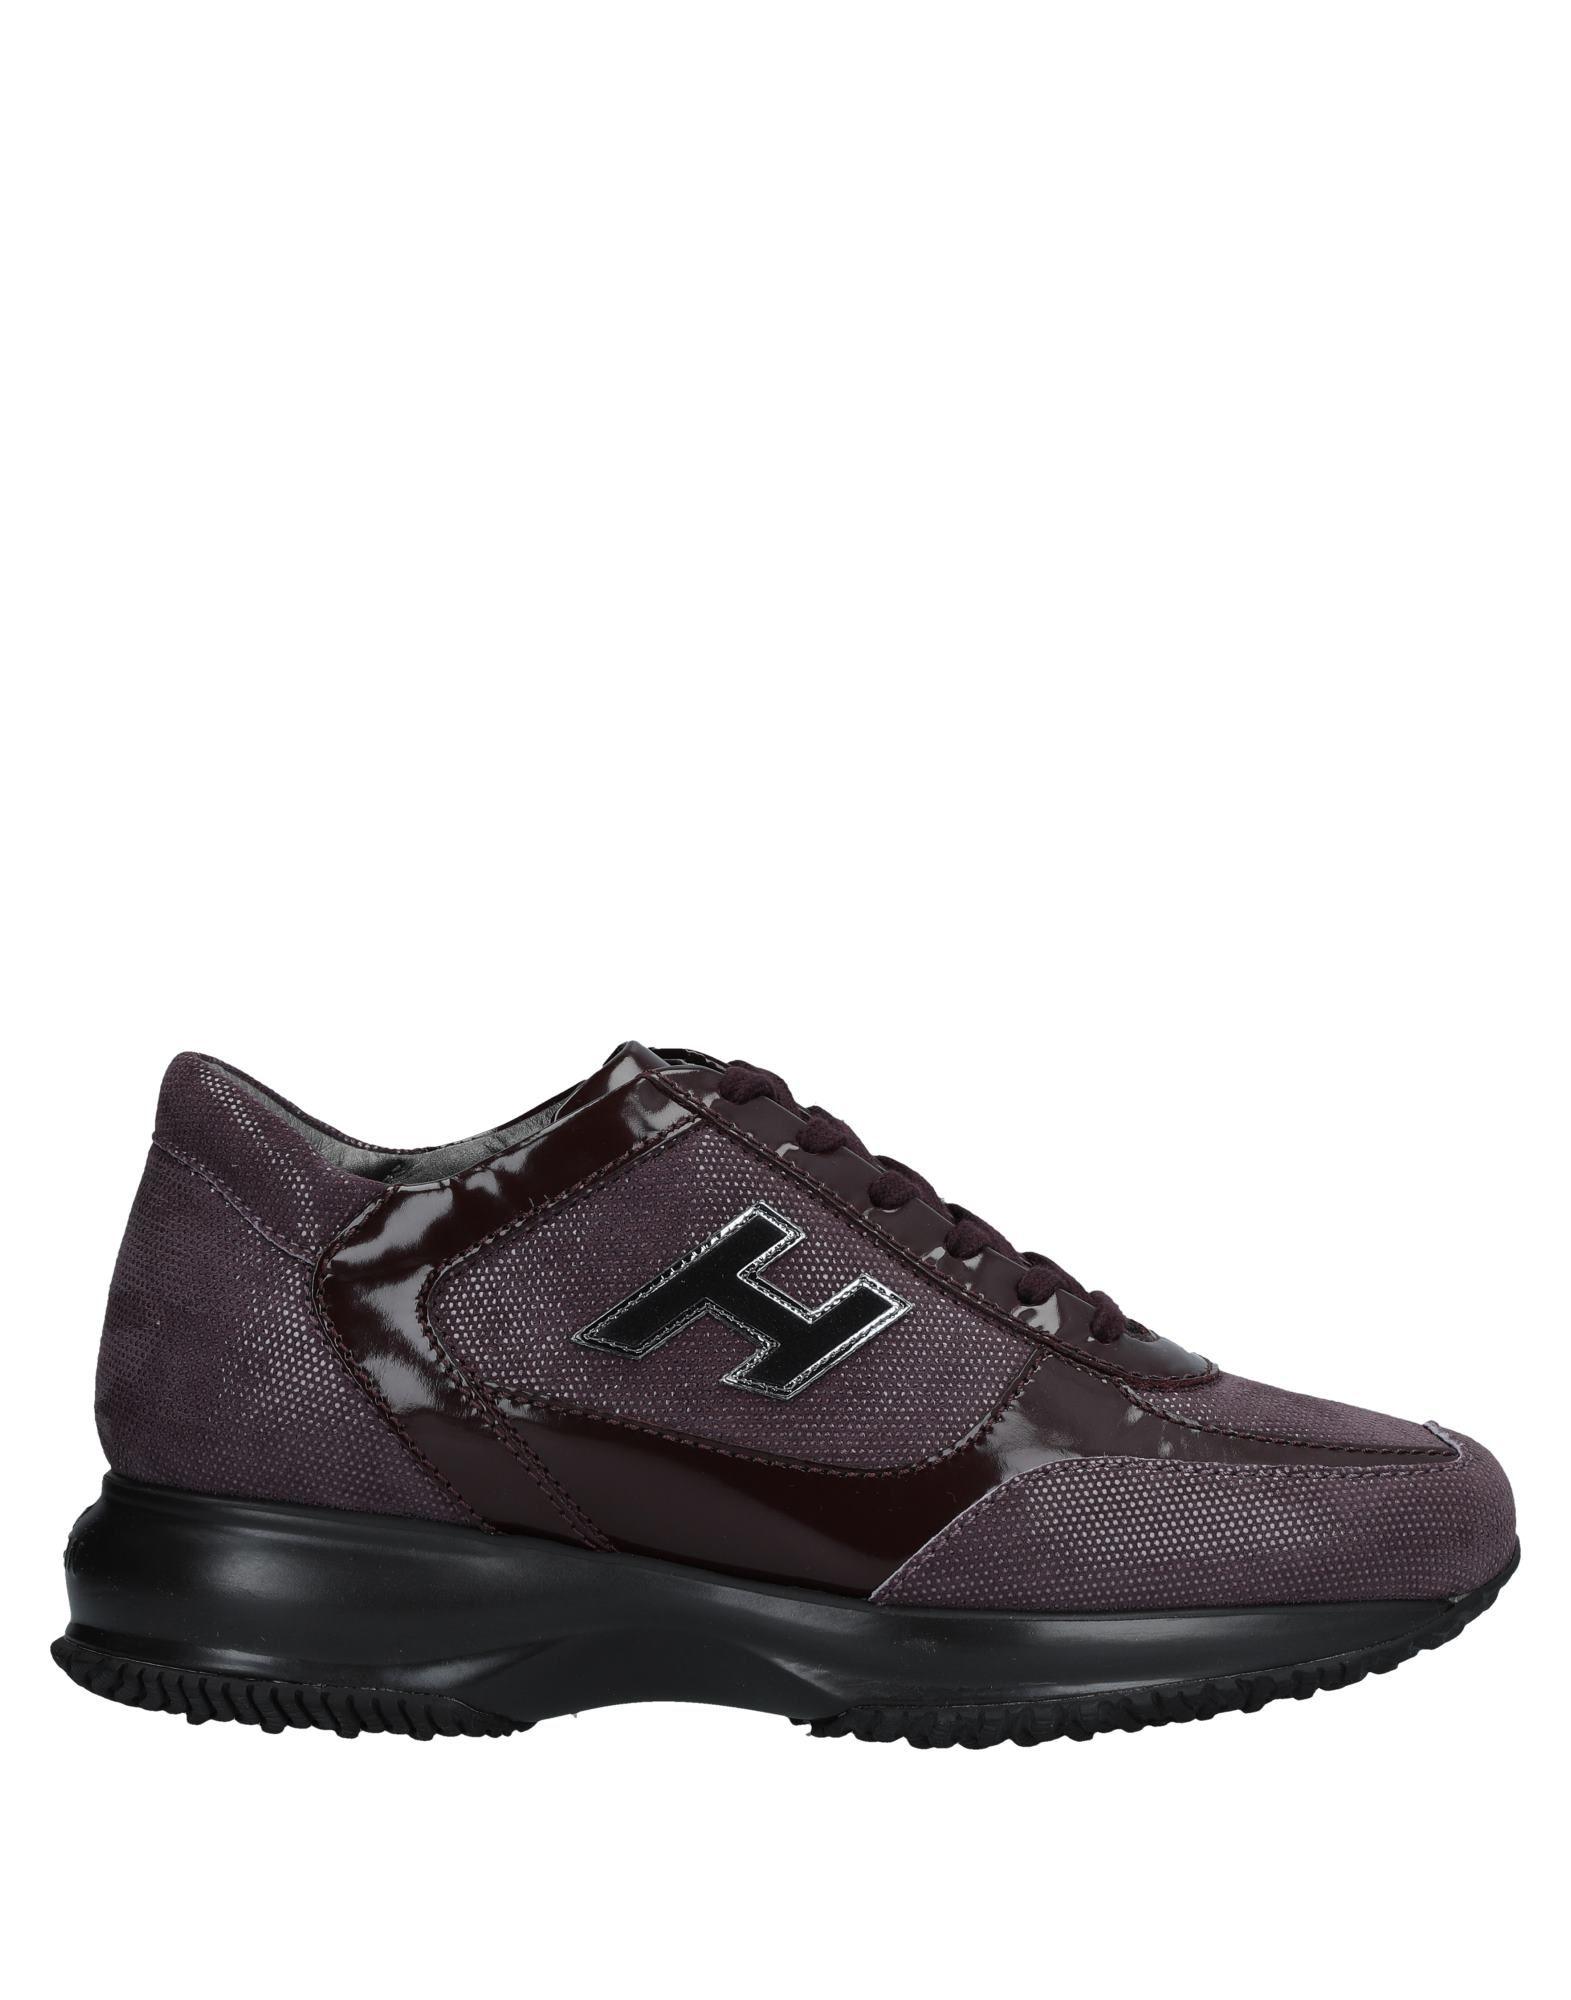 Hogan Sneakers Damen  11541823SGGut aussehende strapazierfähige Schuhe